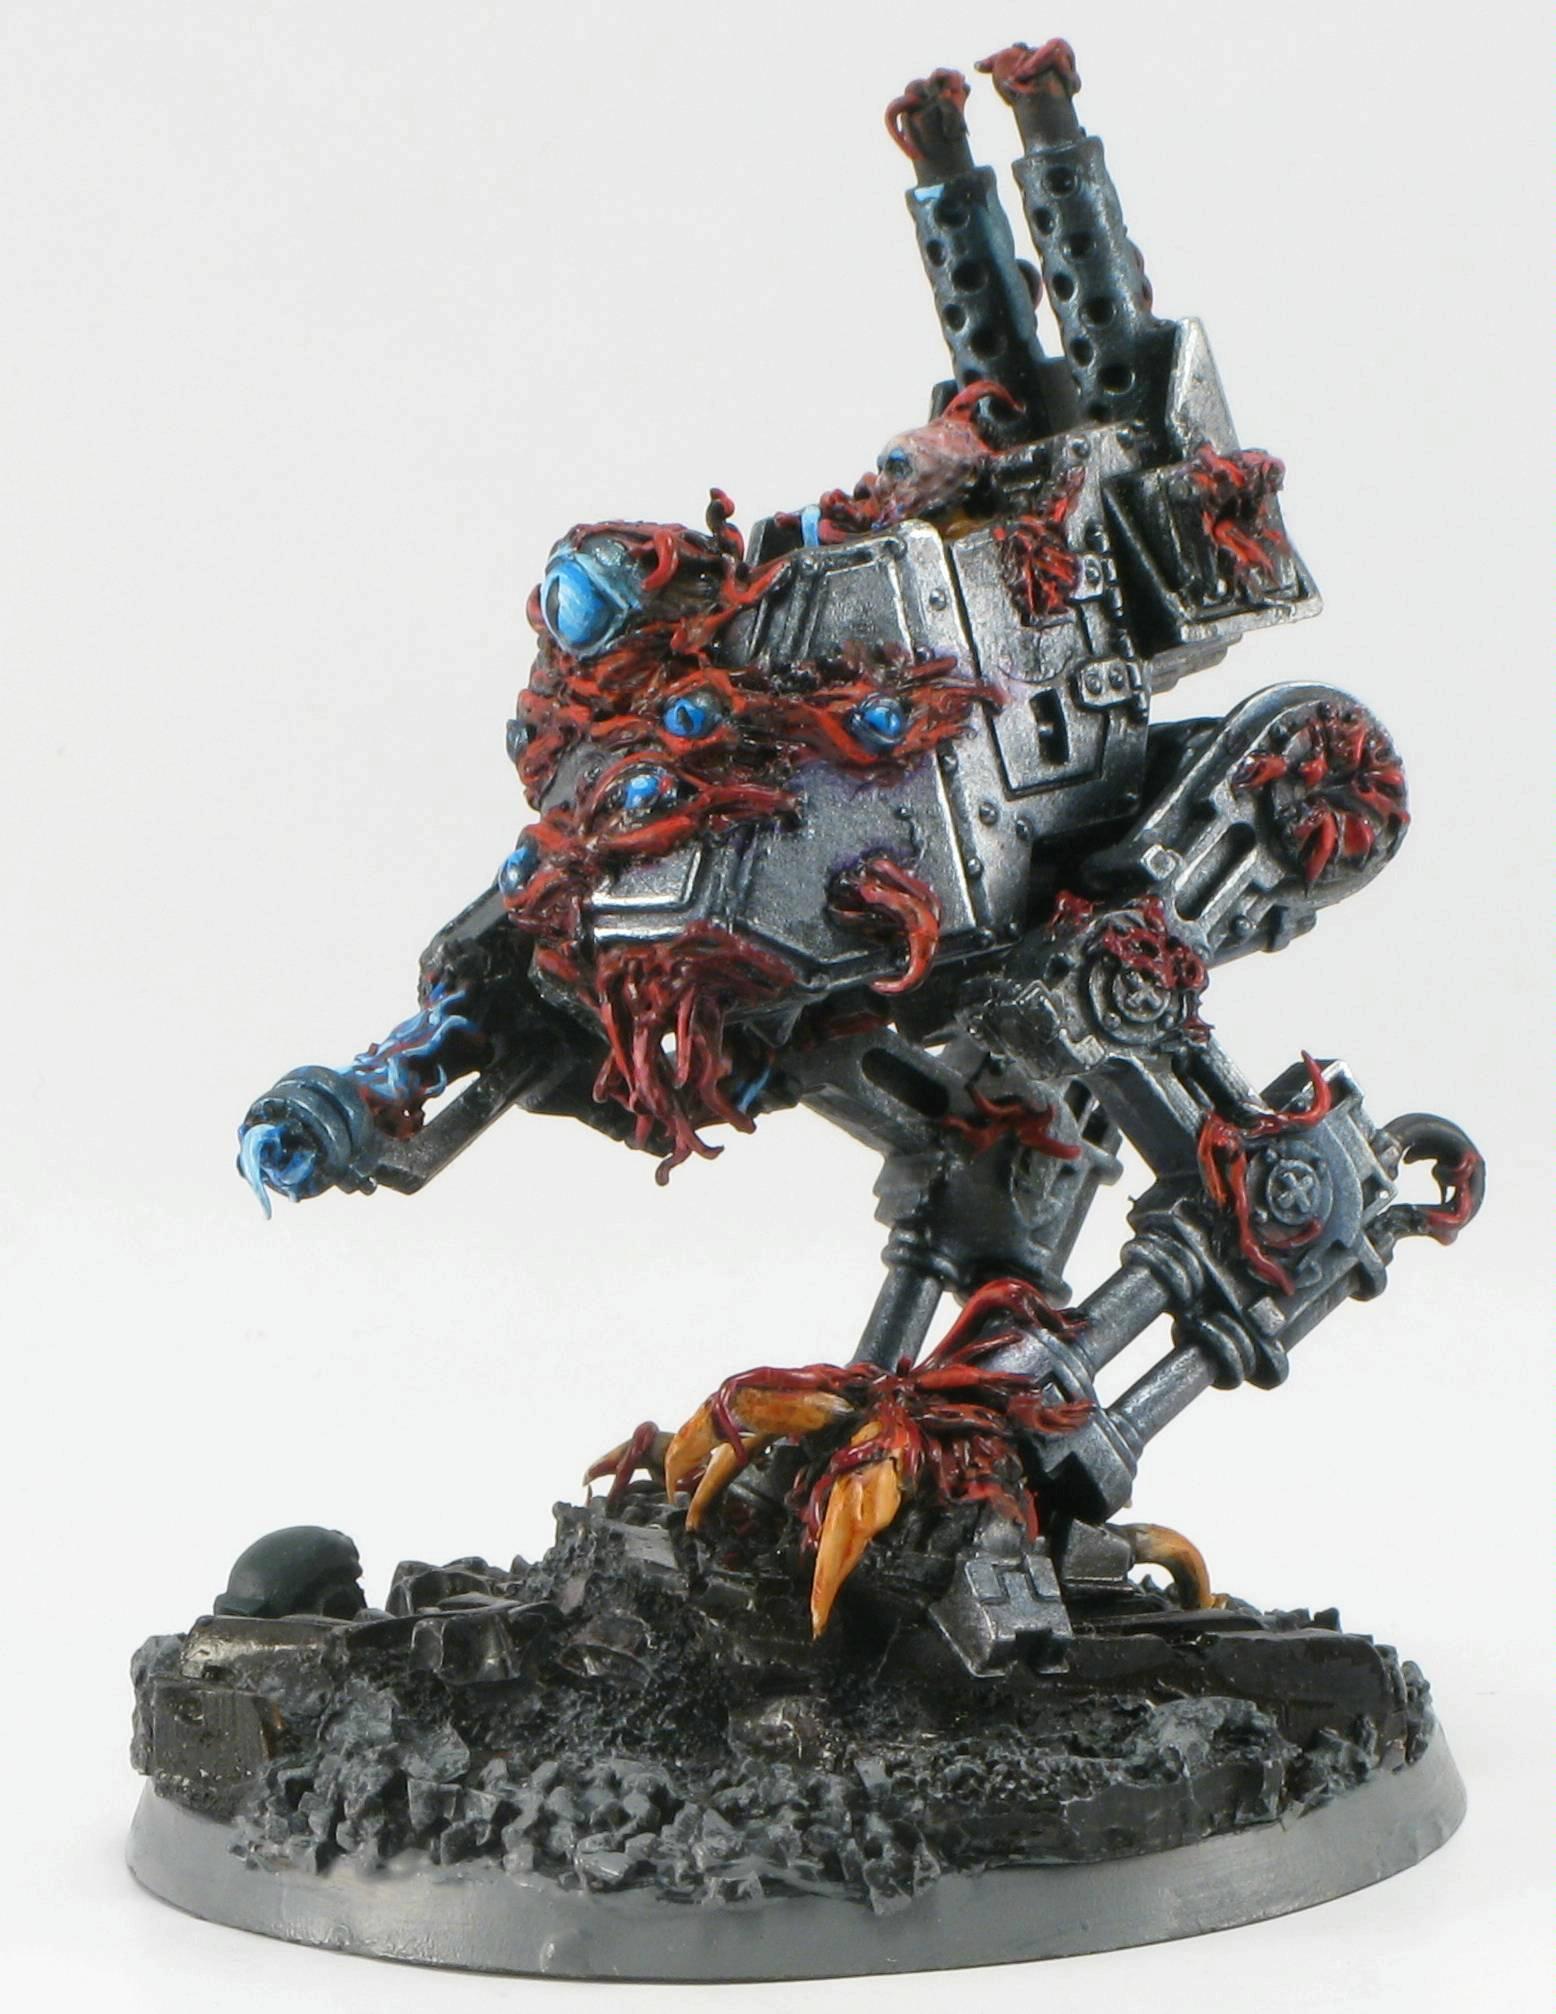 Chaos Daemons, Conversion, Daemon Prince, Daemons, Sentinel, Tzeentch